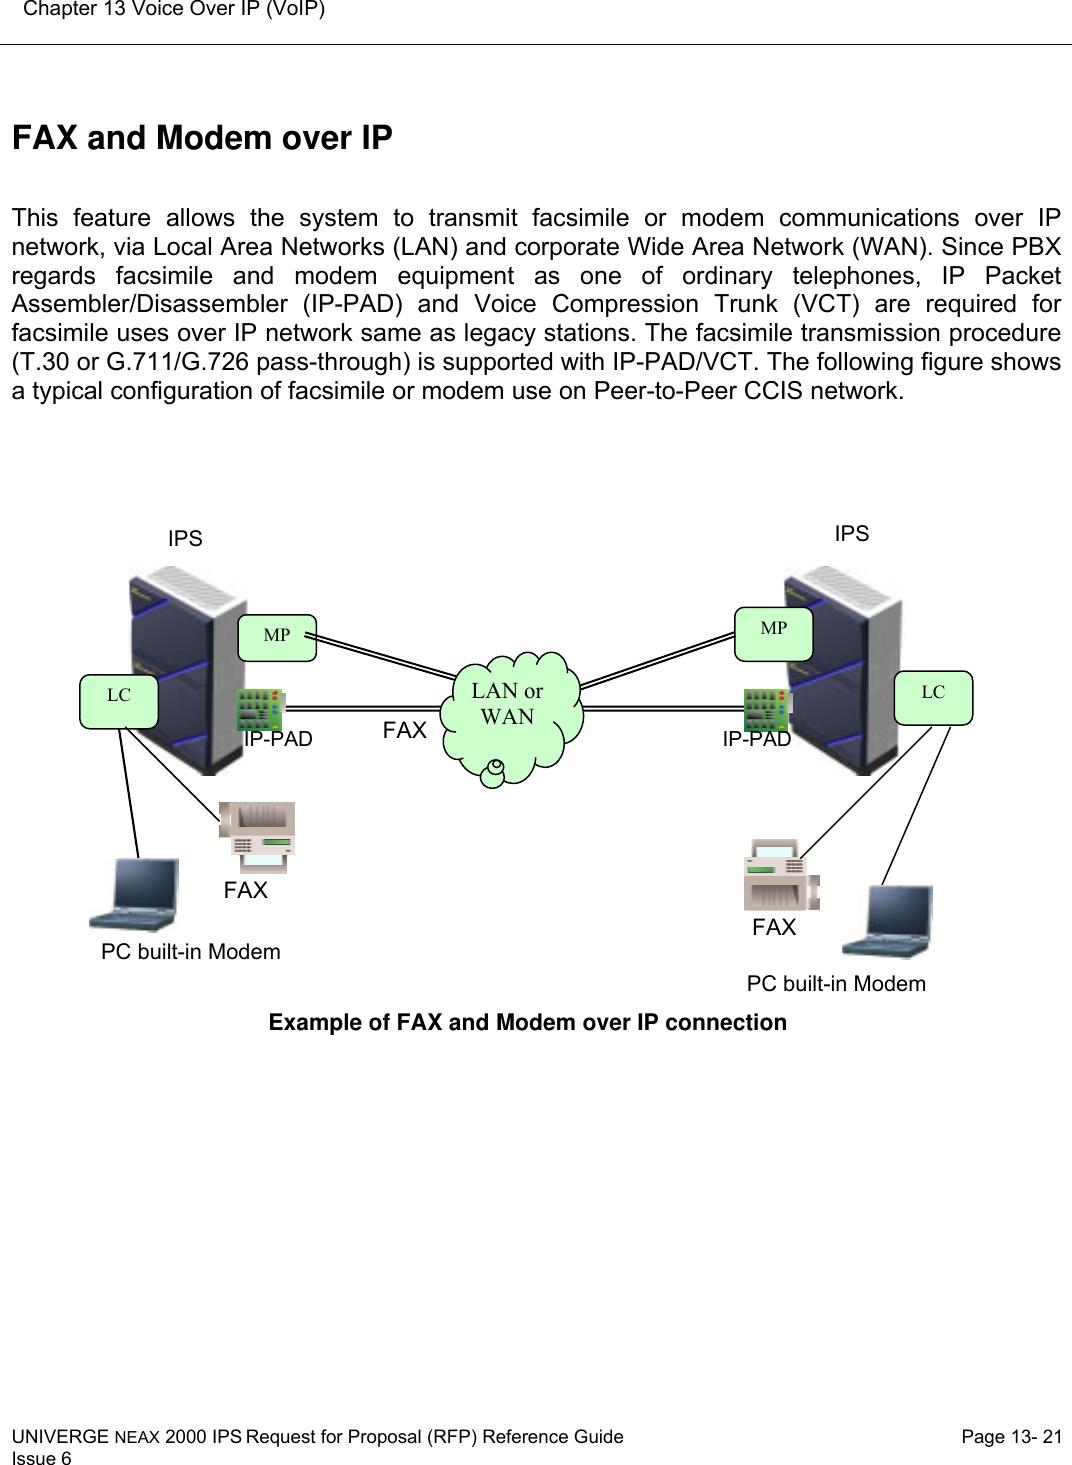 Nec Univerge Neax 2000 Ips Users Manual 2006007RFP on